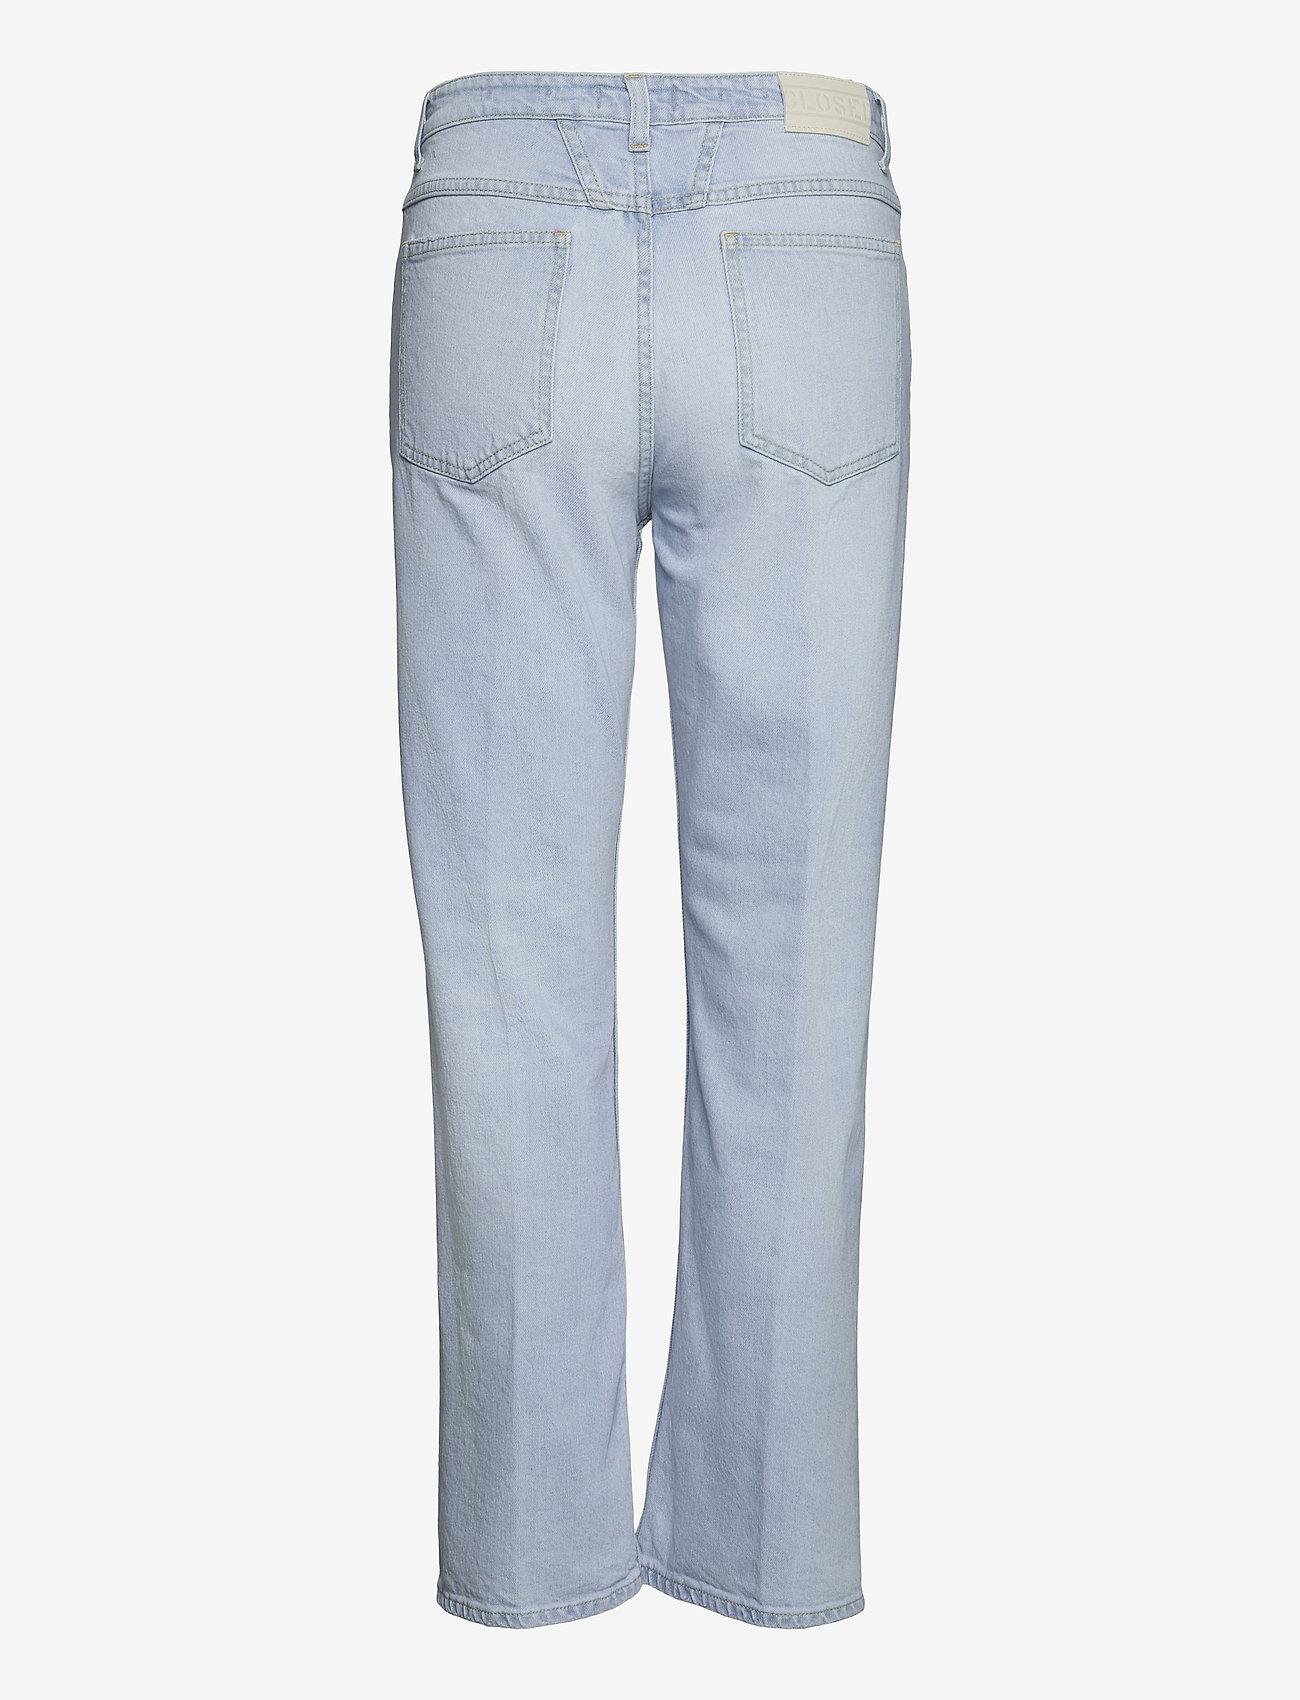 Closed - womens pant - straight regular - light blue - 1